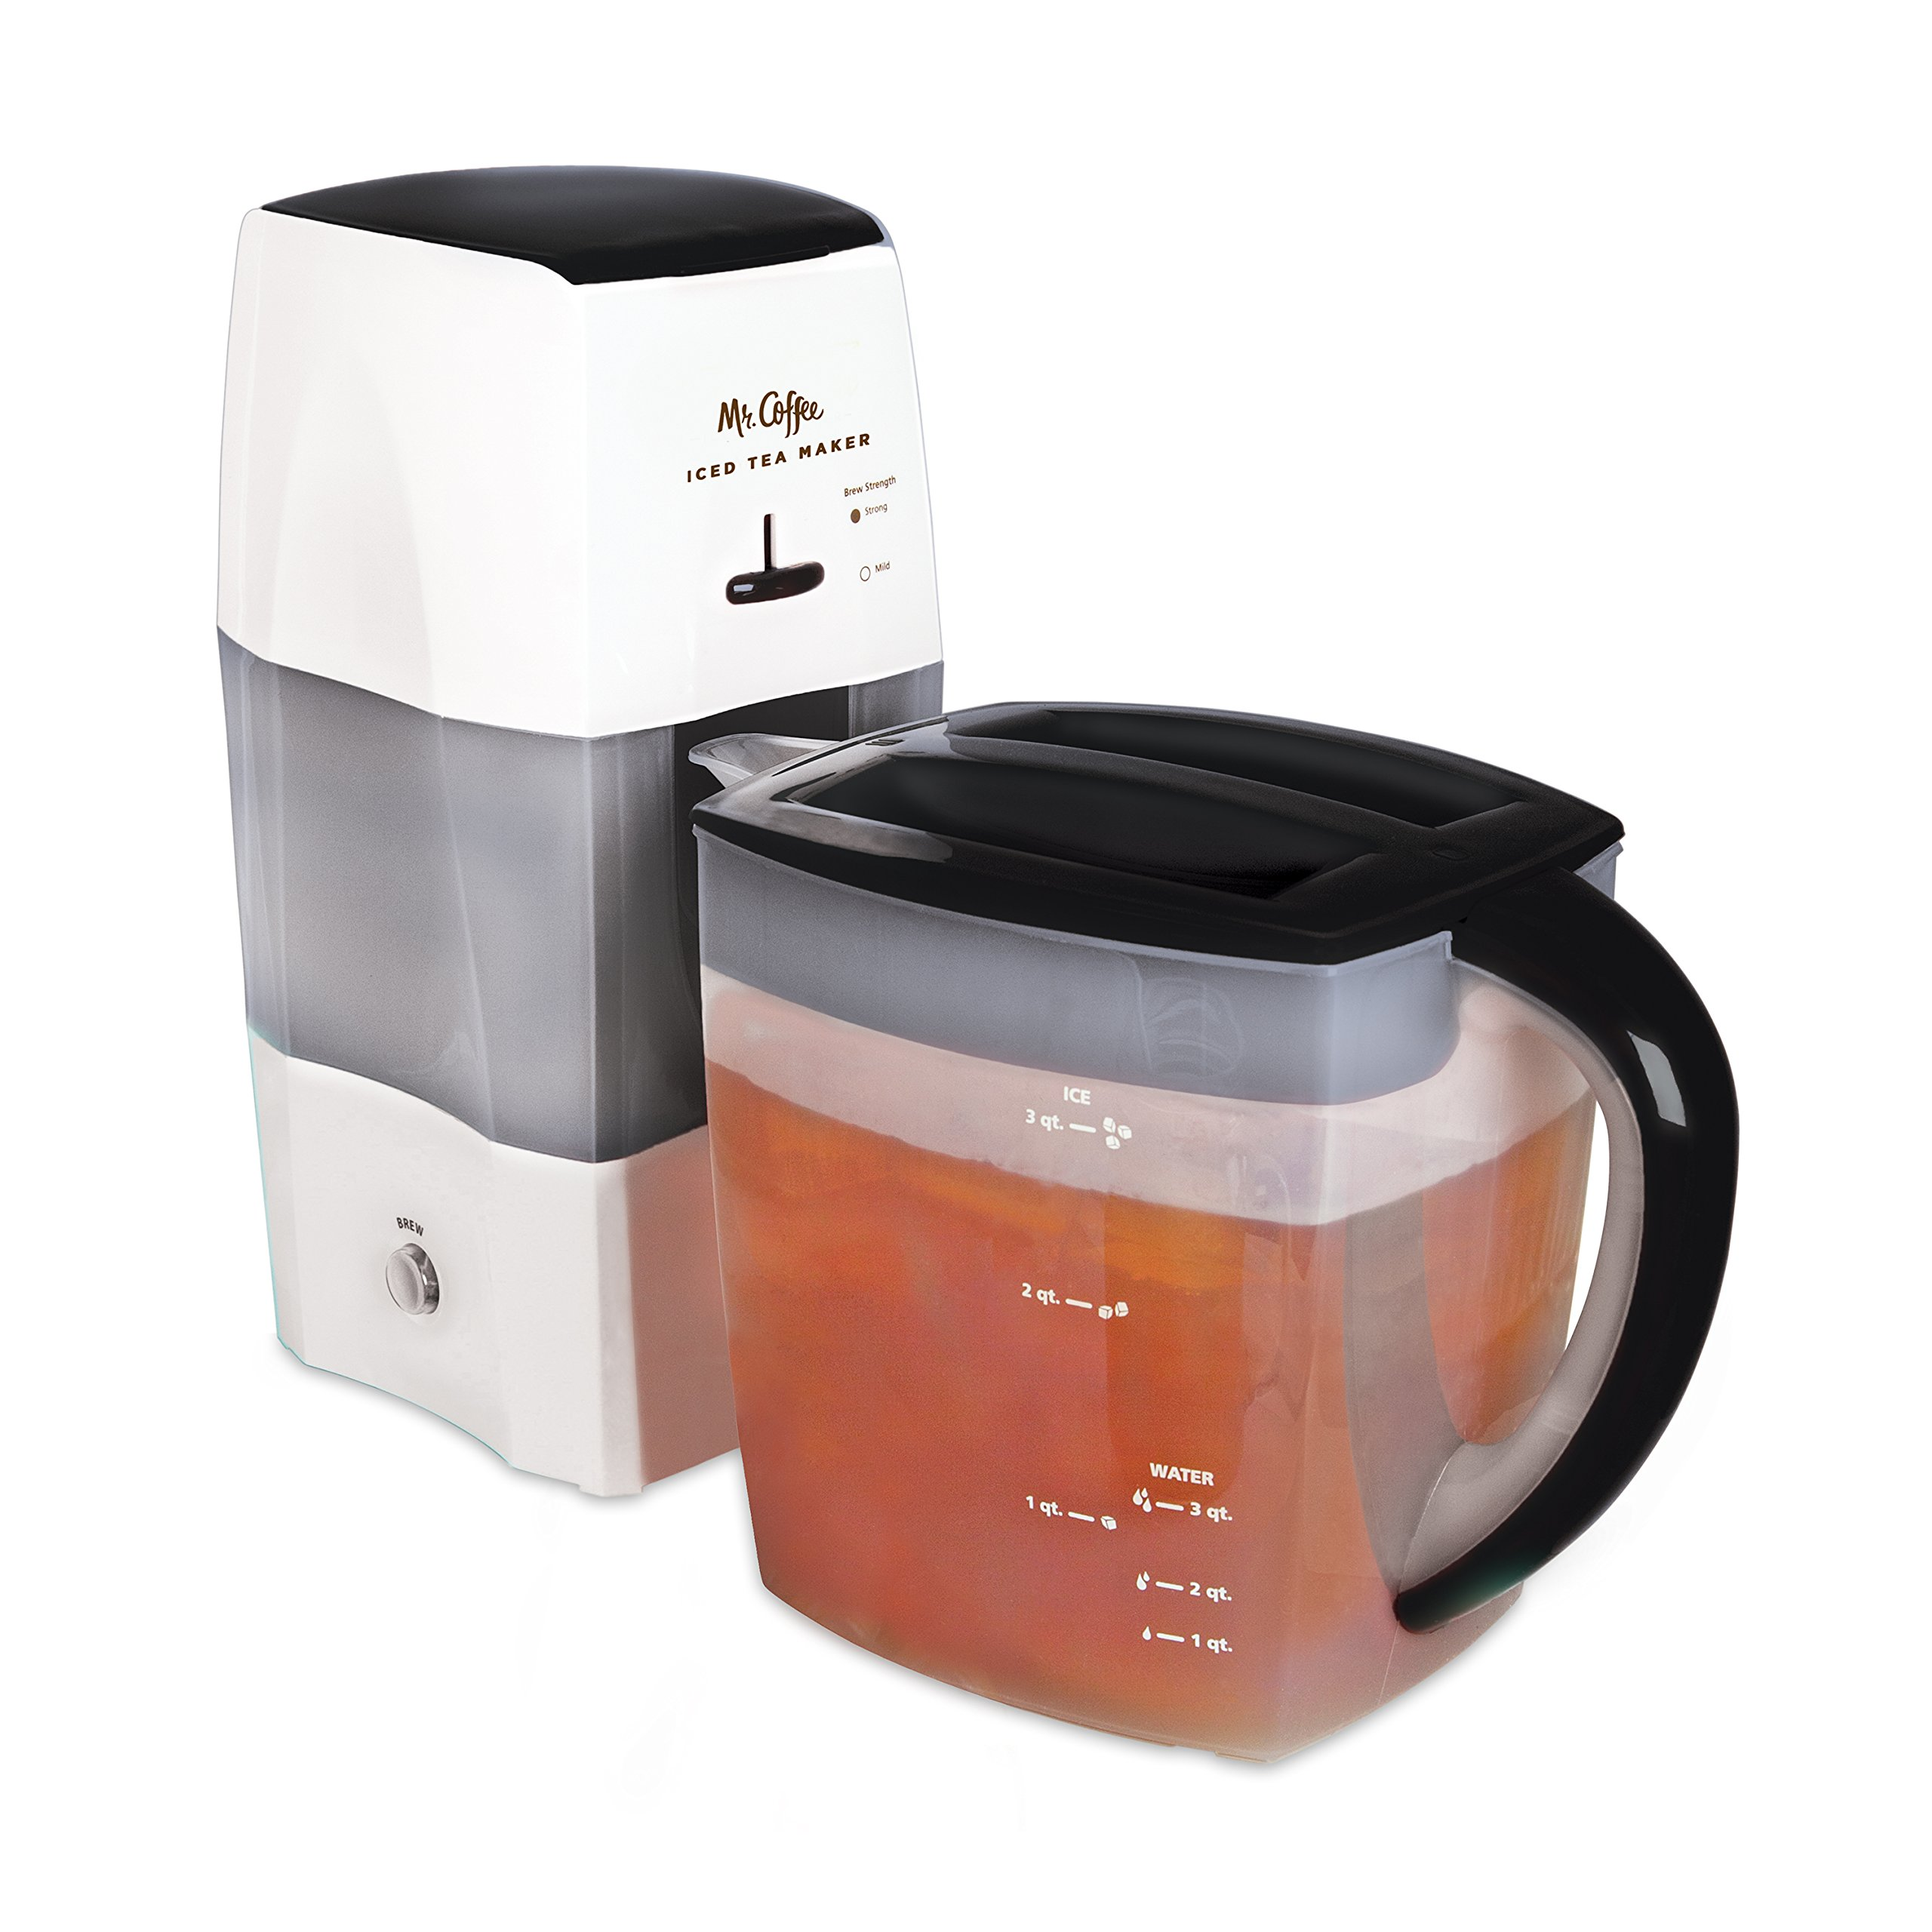 Mr. Coffee 3-Quart Iced Tea and Iced Coffee Maker, Black by Mr. Coffee